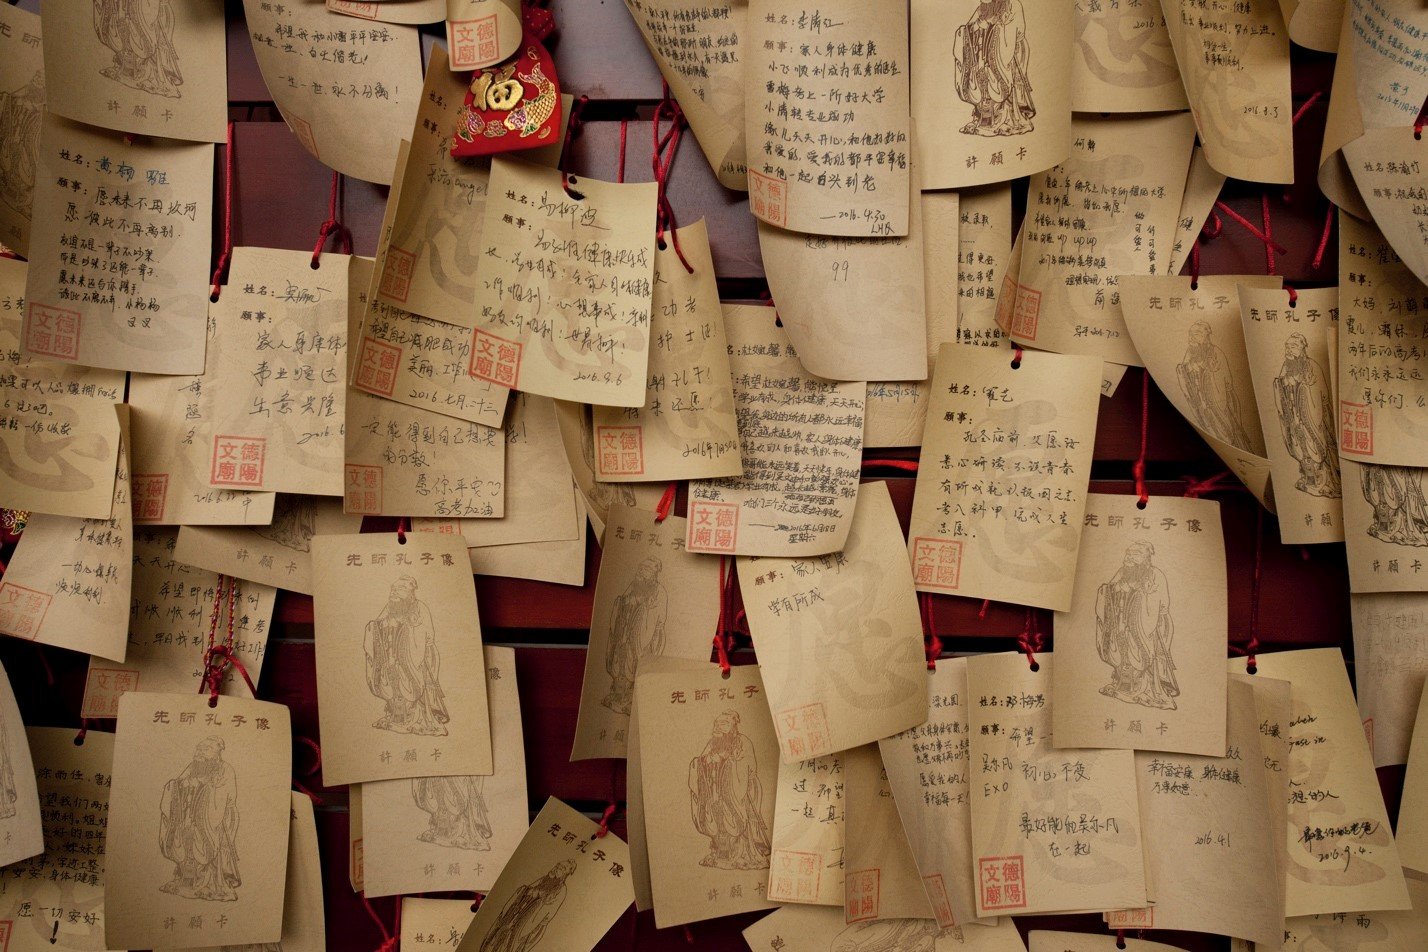 Buddhist scrolls